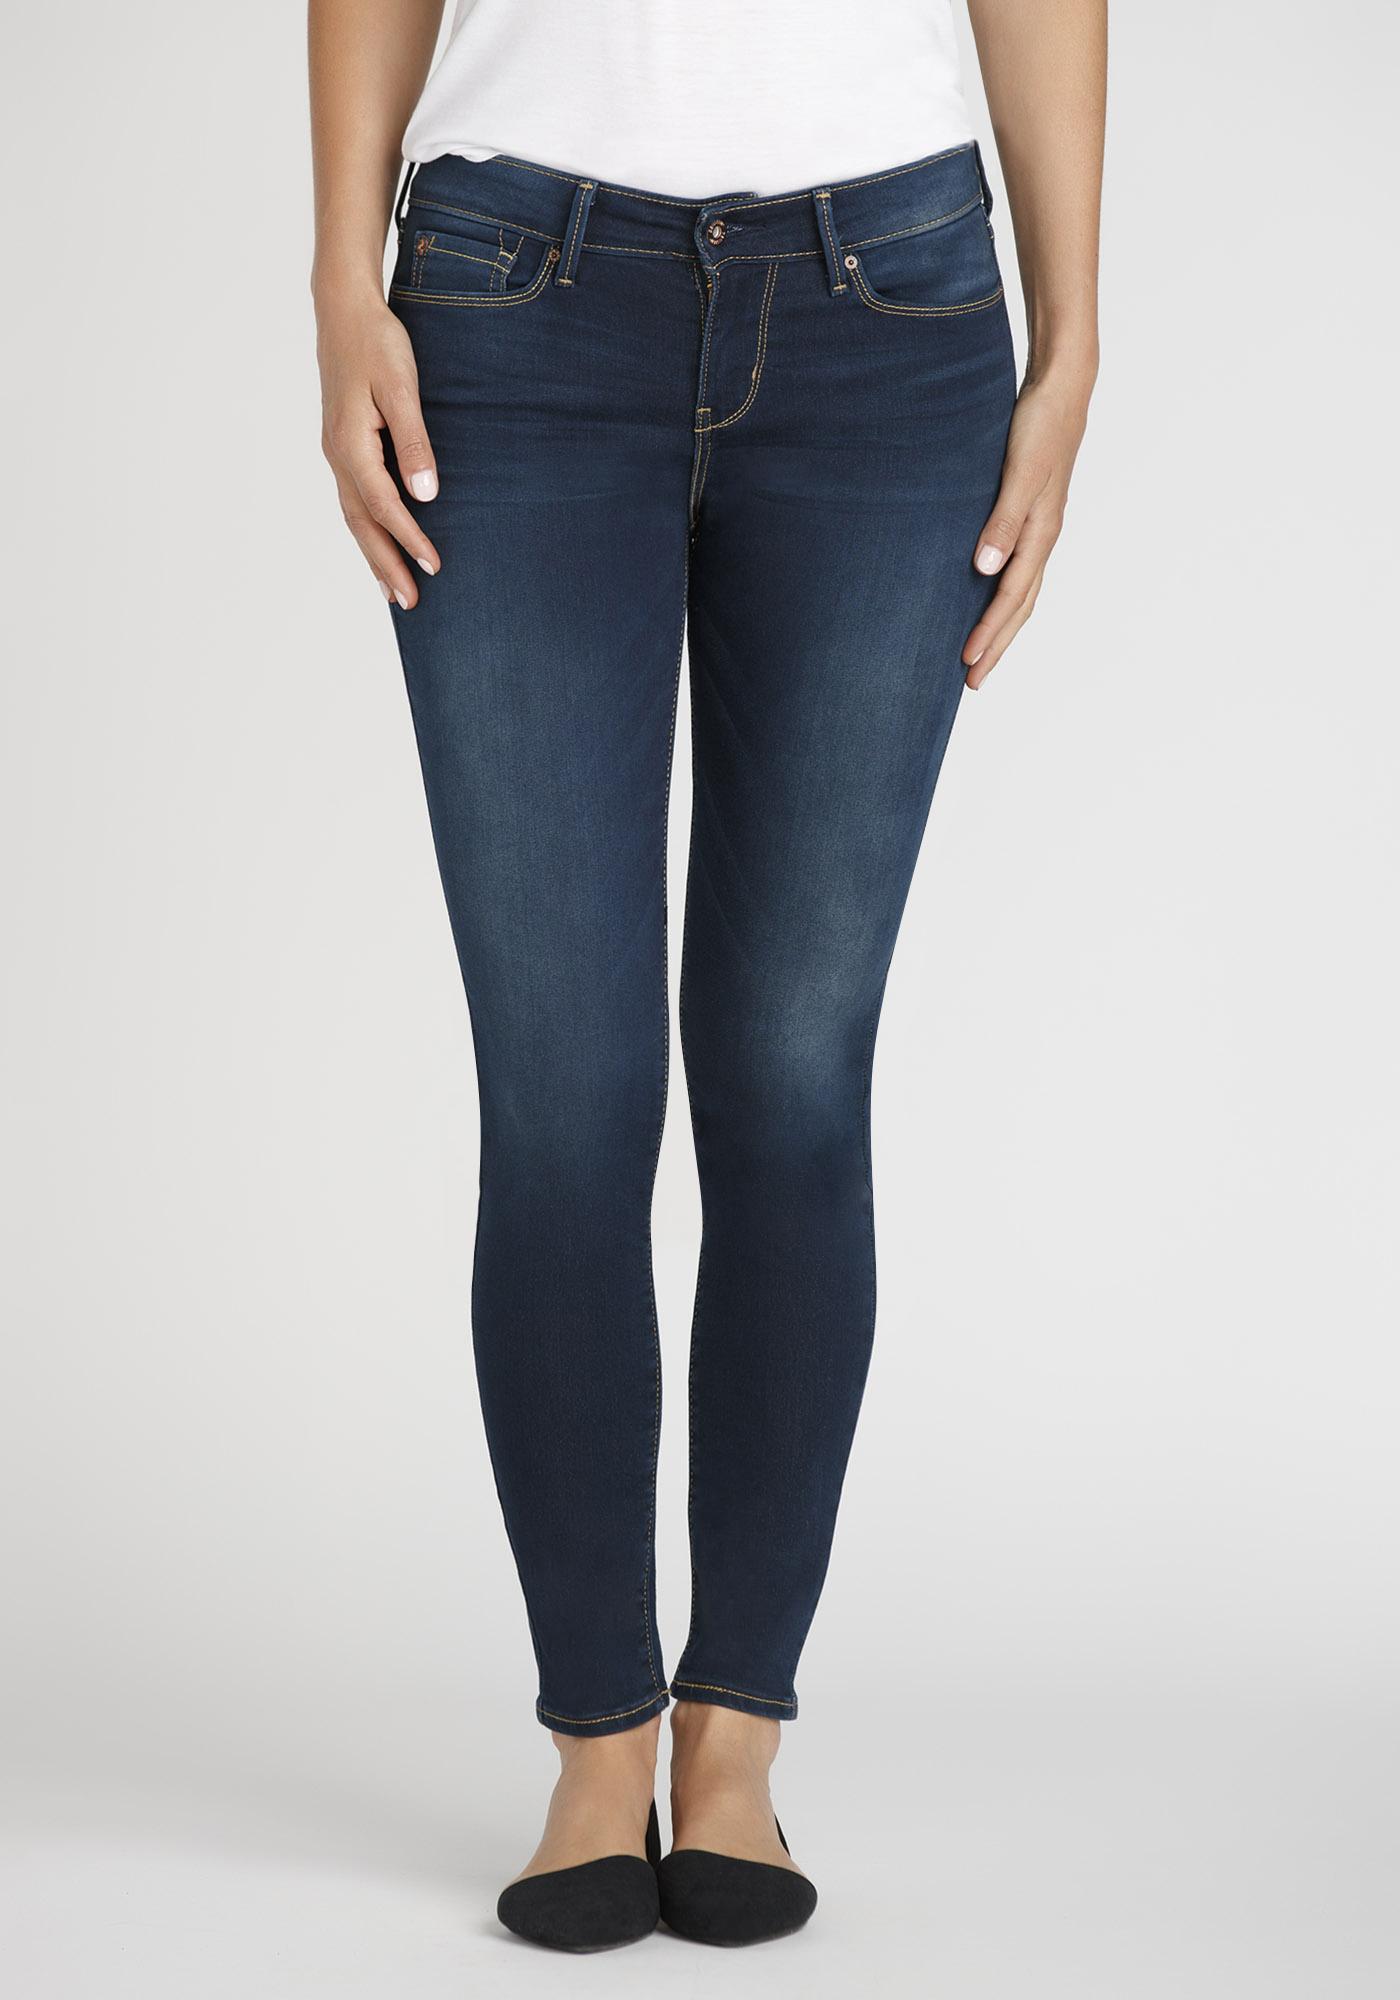 86165a2b7be00 Women s Skinny Jeans